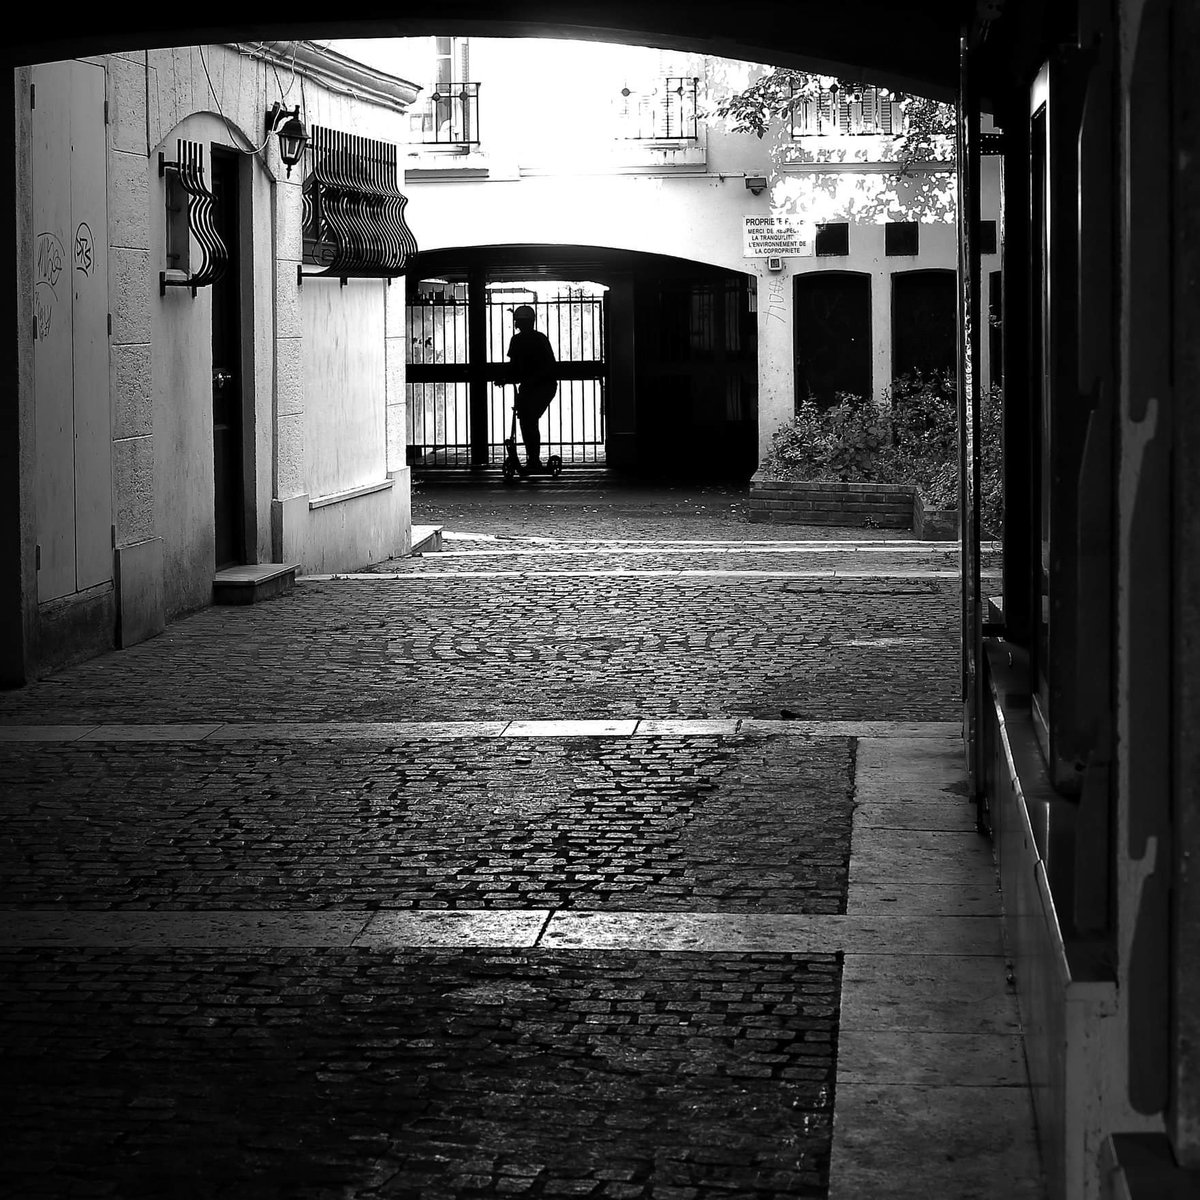 Deep down #streetphotography #blackandwhite  #street #Paris #pacalcolin #canon #50mmpic.twitter.com/ll6eQ5fAUm